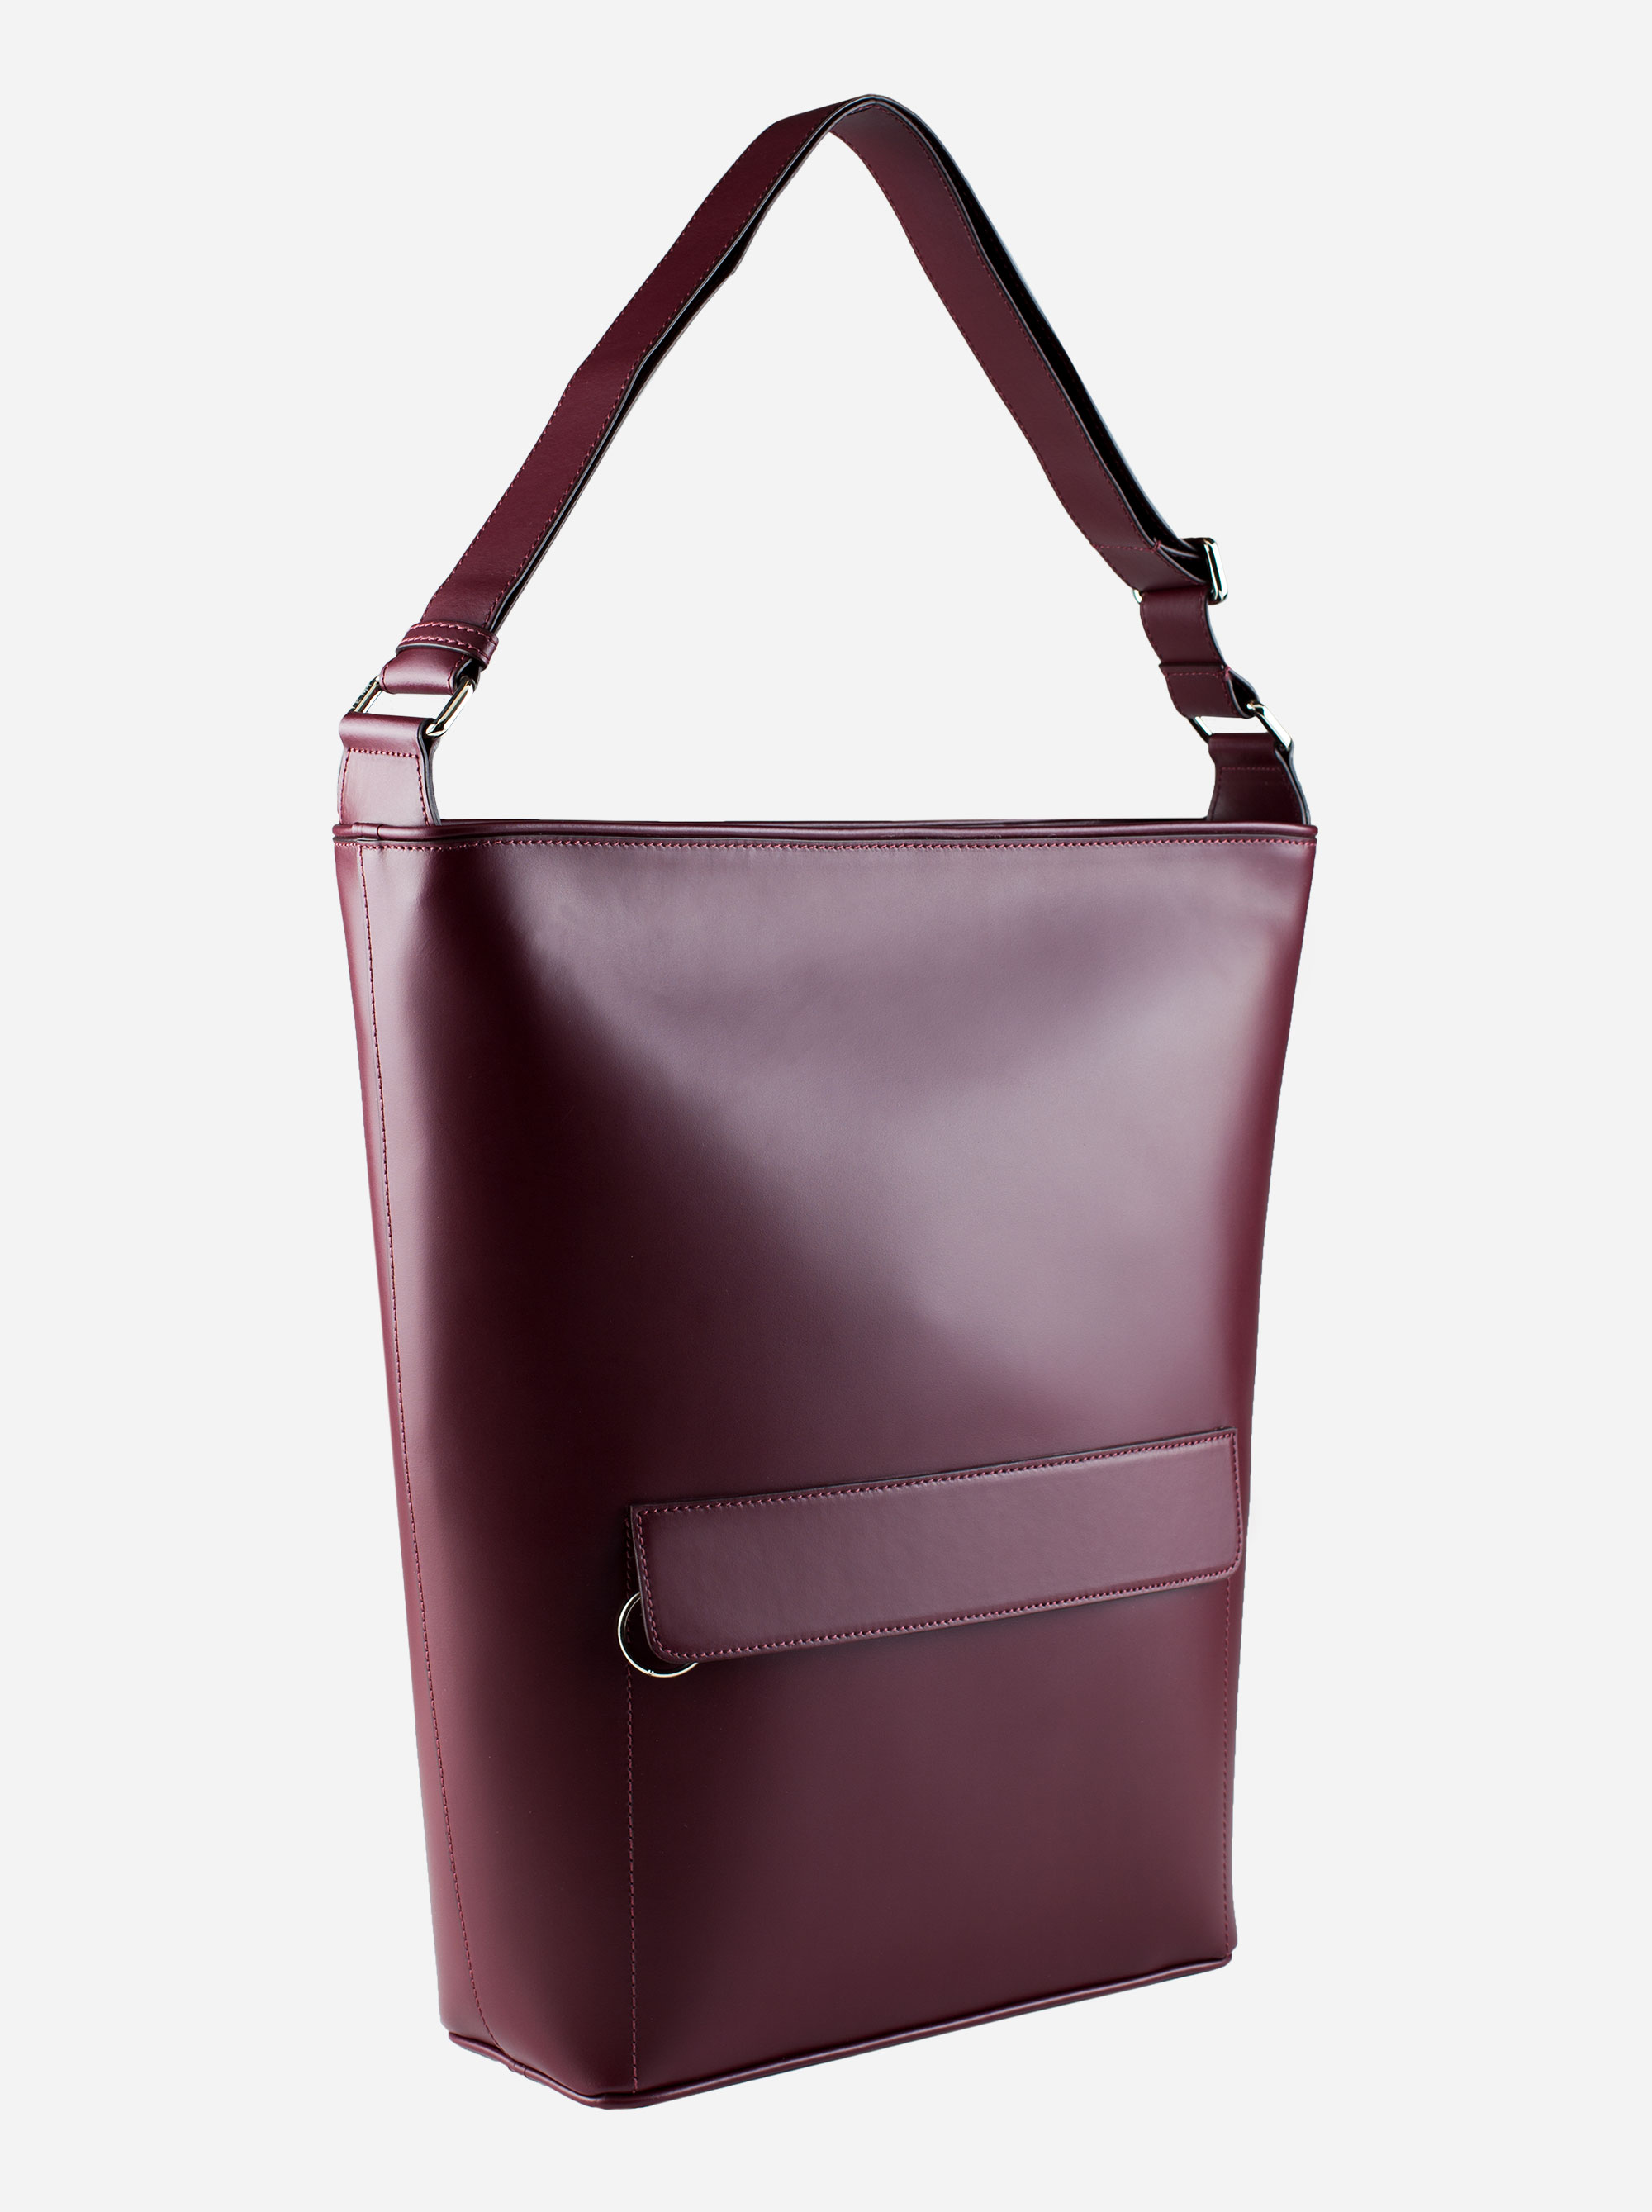 Teym - The Shoulder Bag - Burgundy - 3